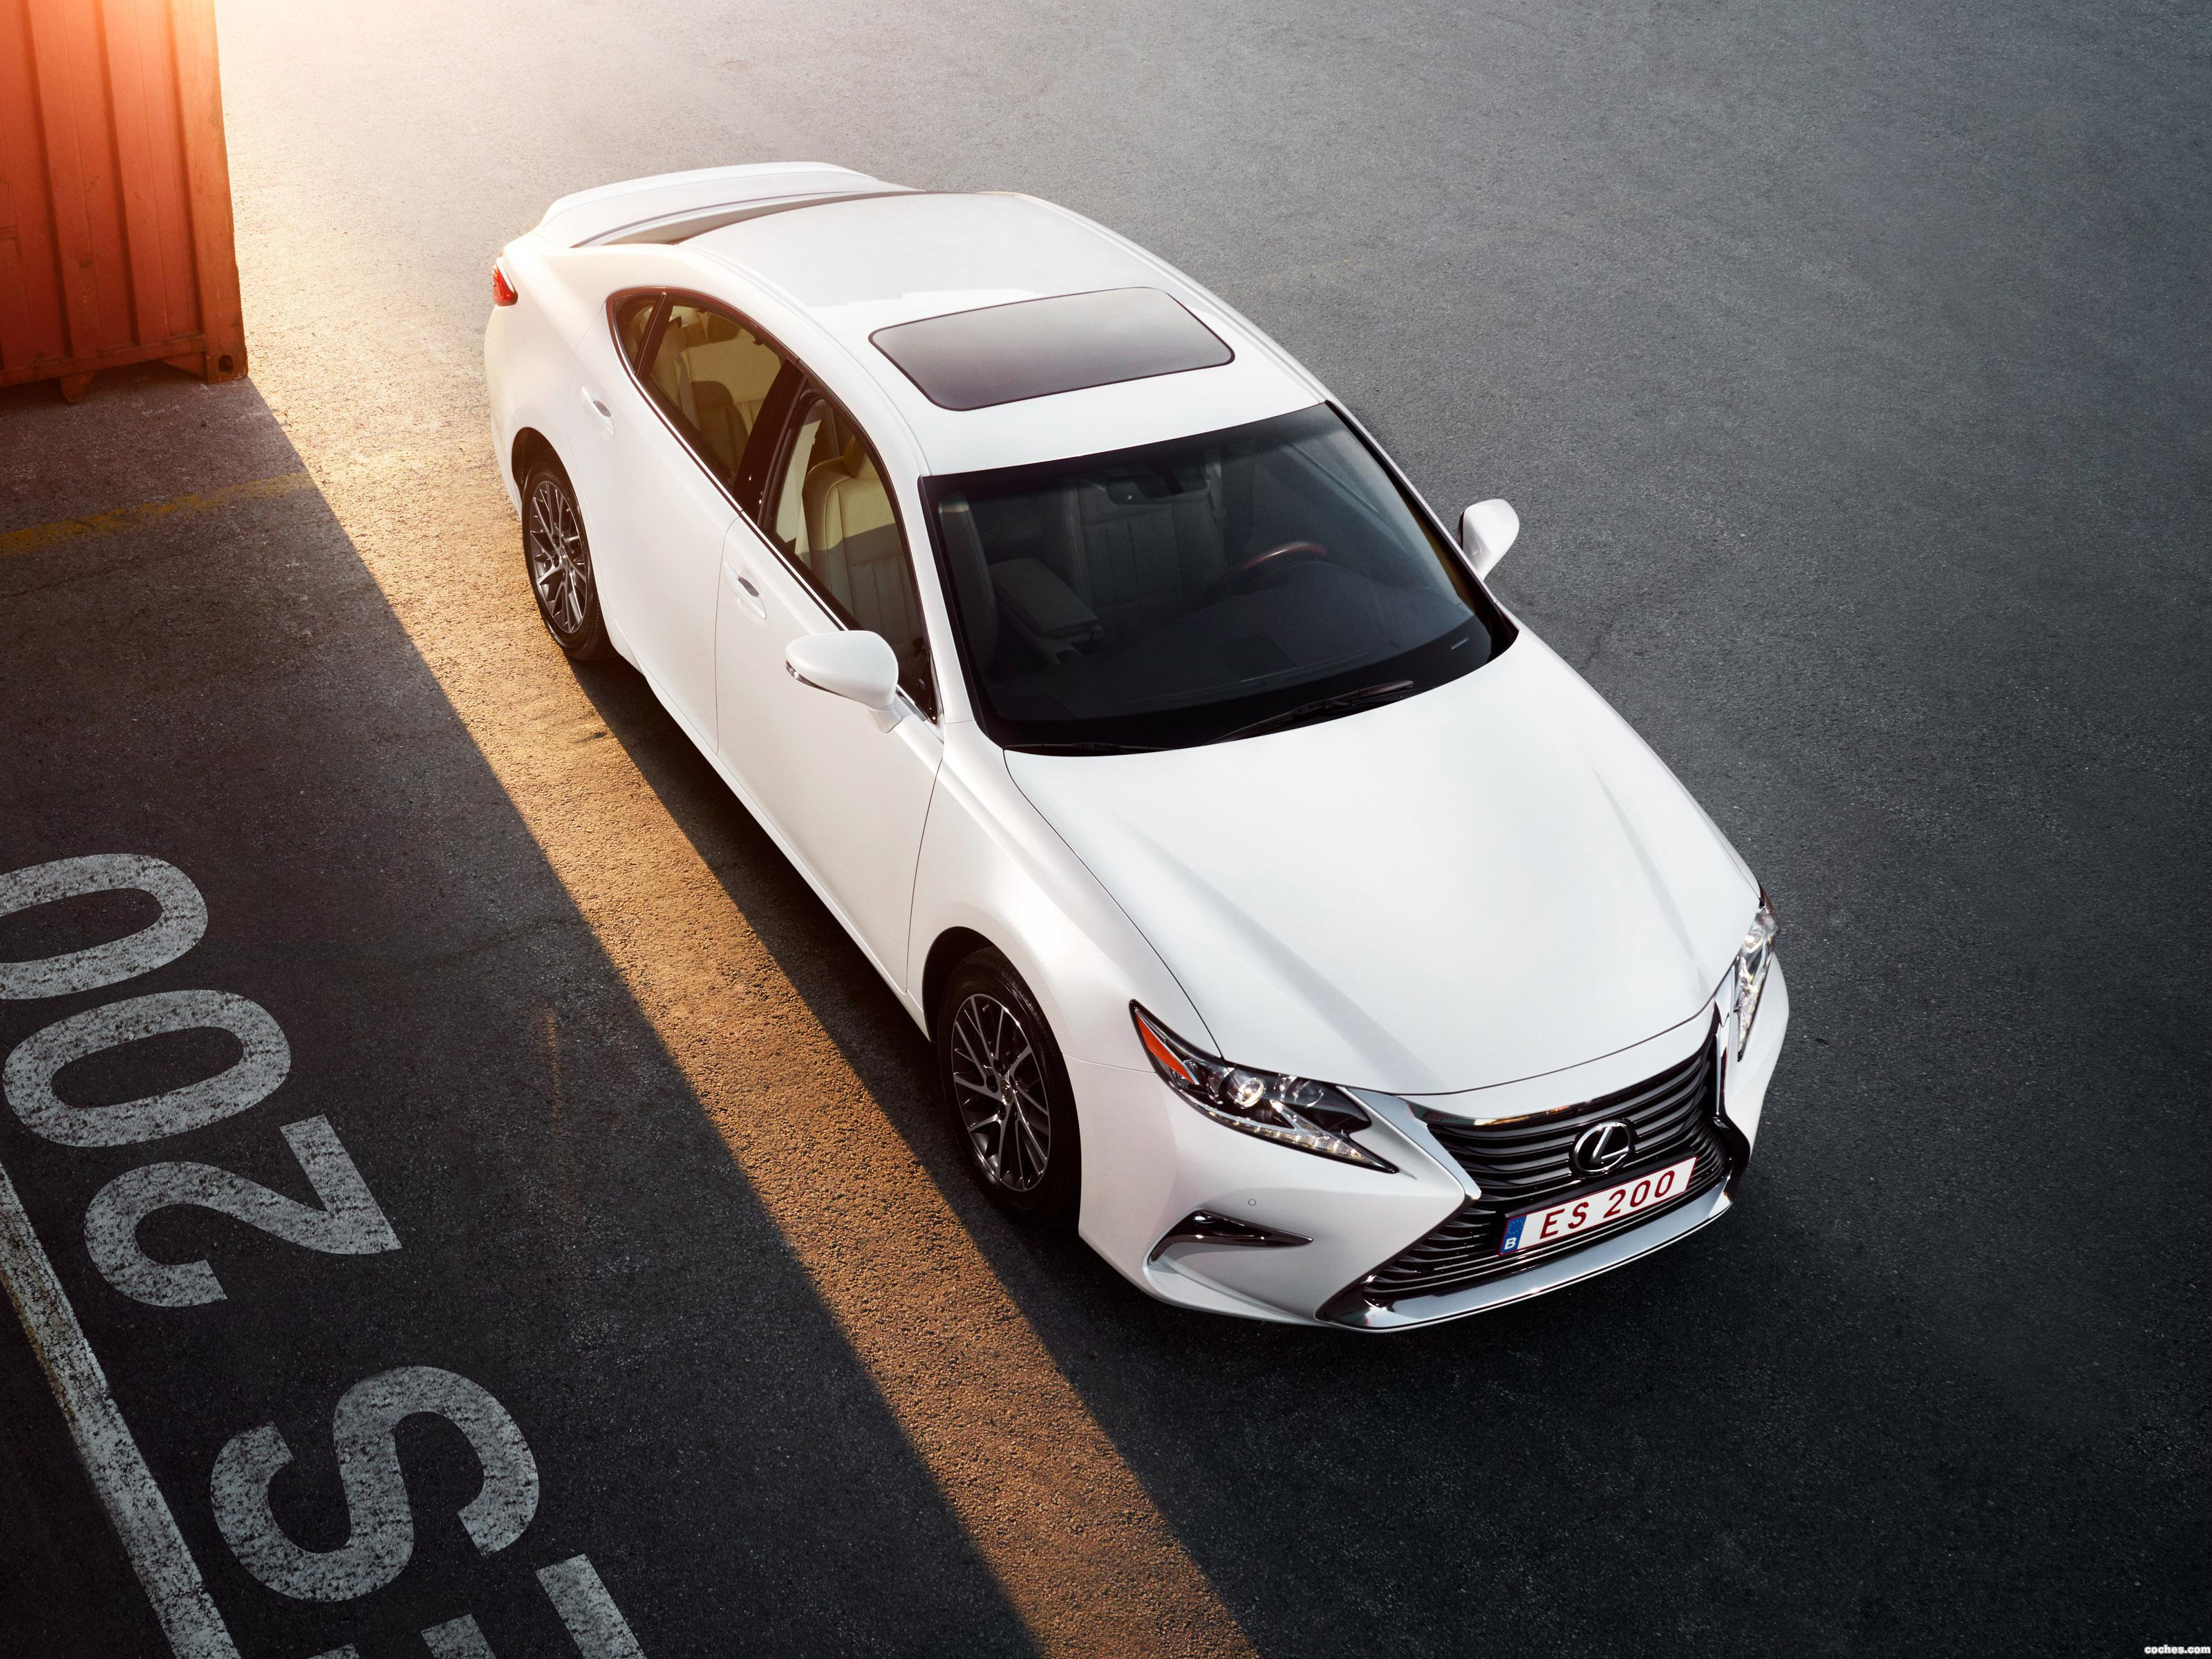 Foto 0 de Lexus ES 200 2015